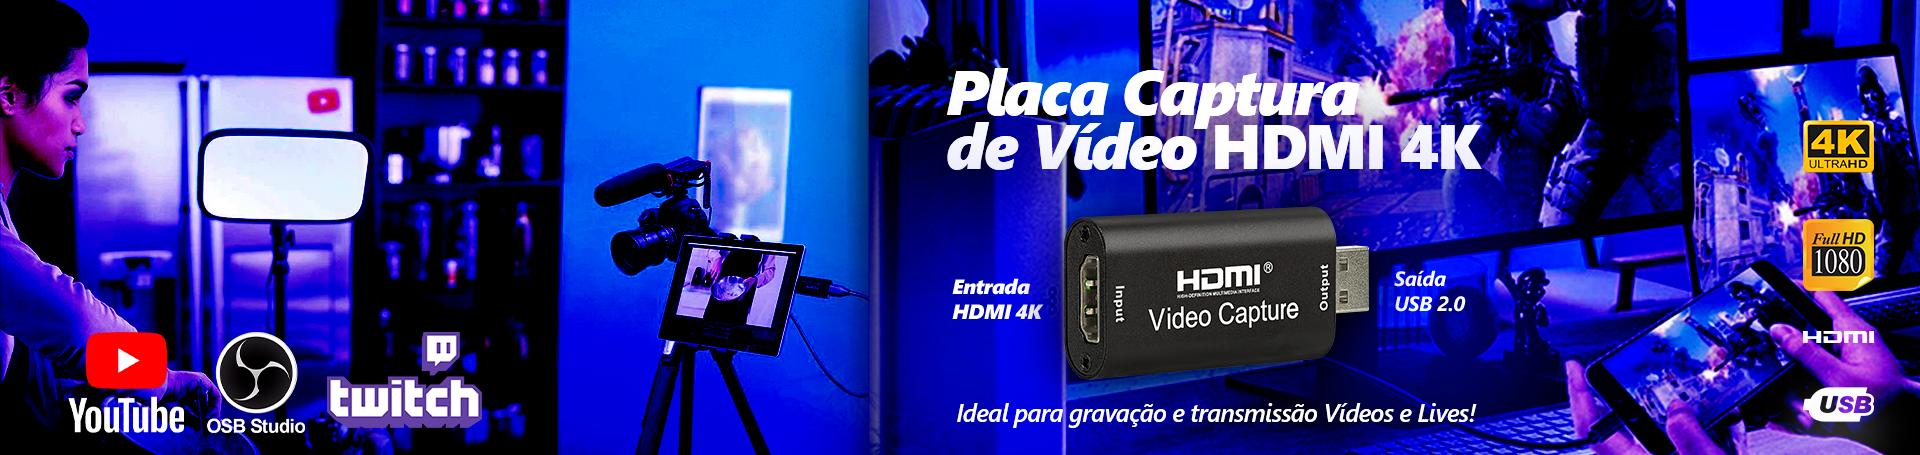 Placa de Captura de Vídeo HDMI USB 4K Streaming